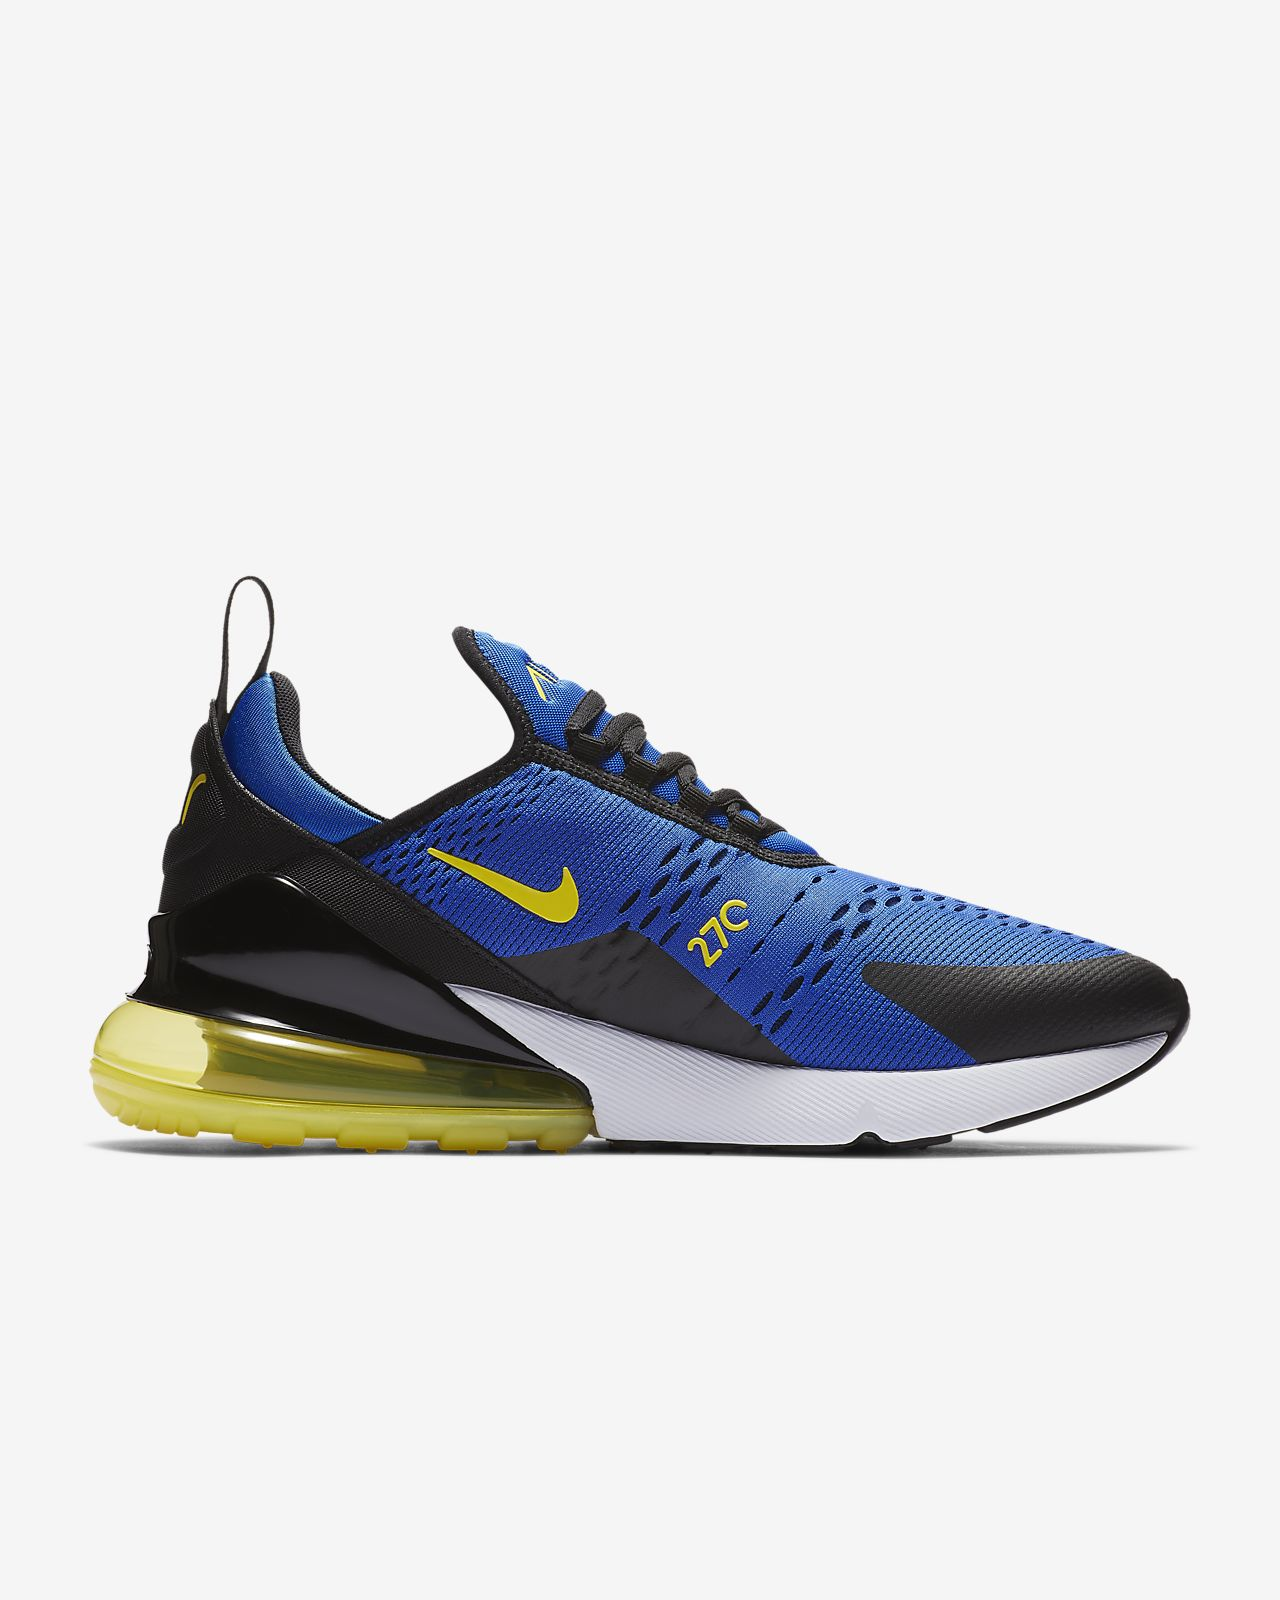 low priced 0e5d6 10cf6 ... Buty męskie Nike Air Max 270